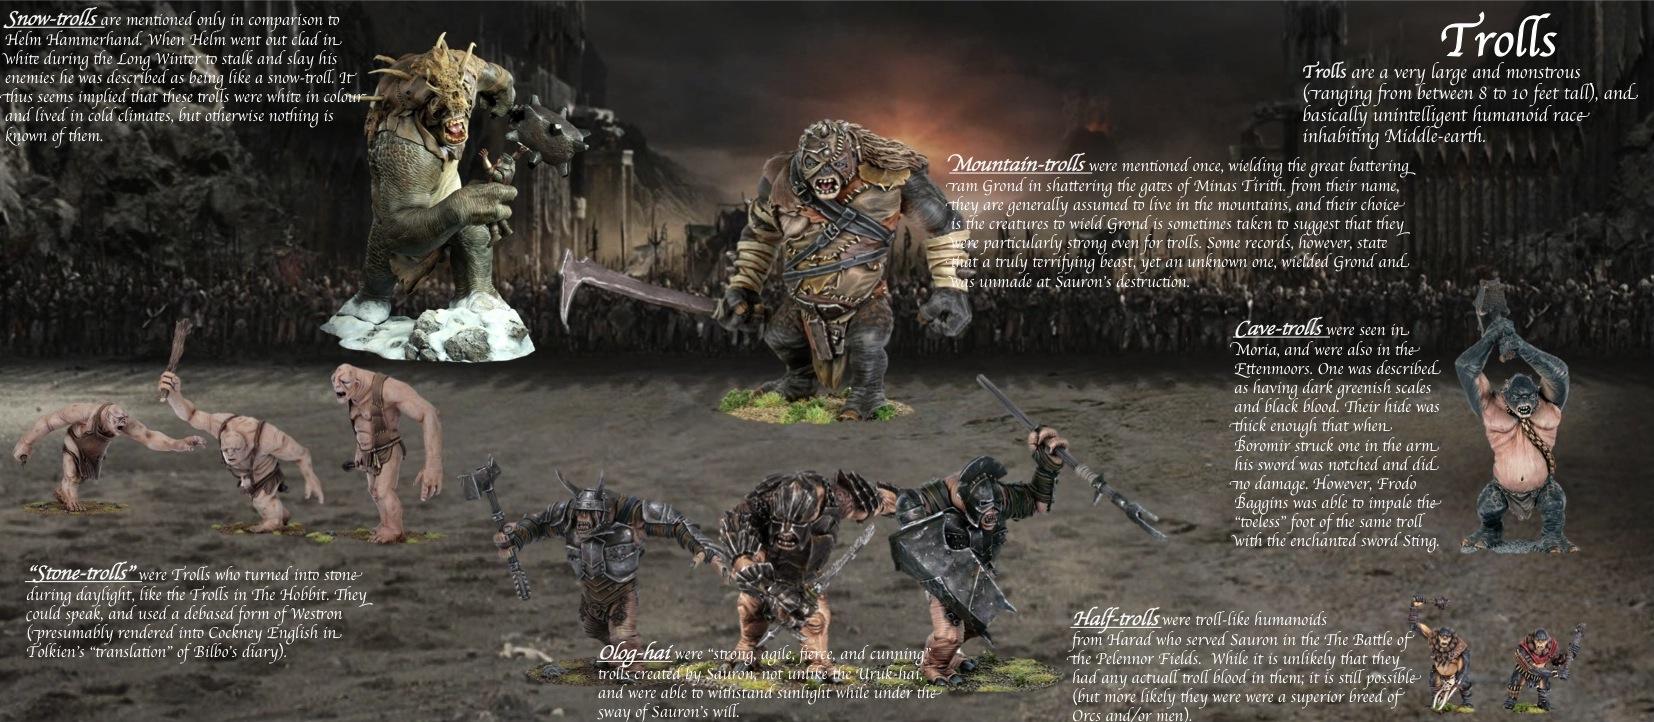 Trolls (Middle-earth)